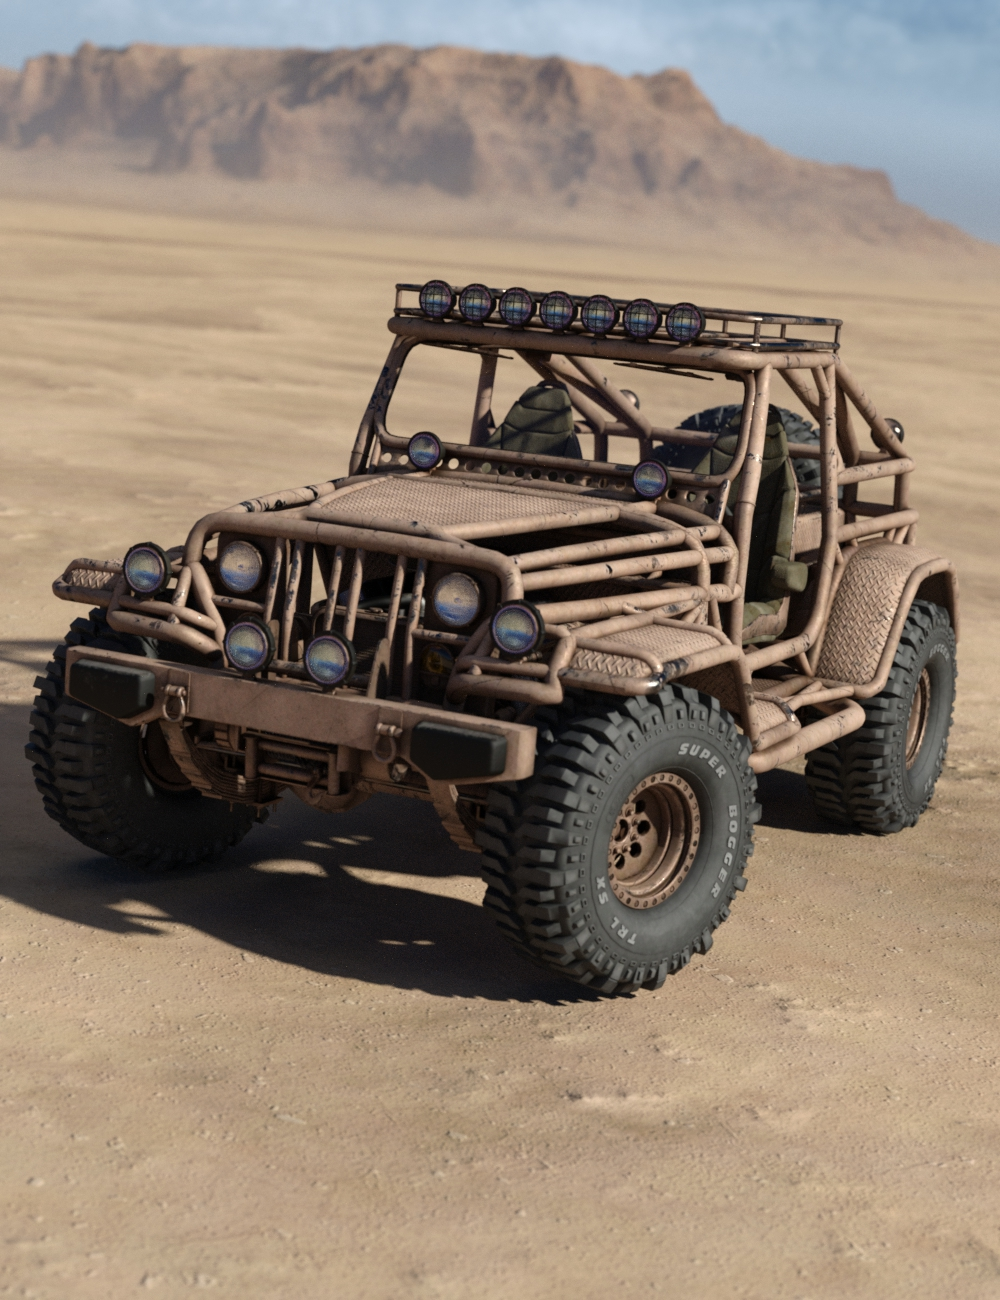 Snake Wrangler Truck by: DzFire, 3D Models by Daz 3D